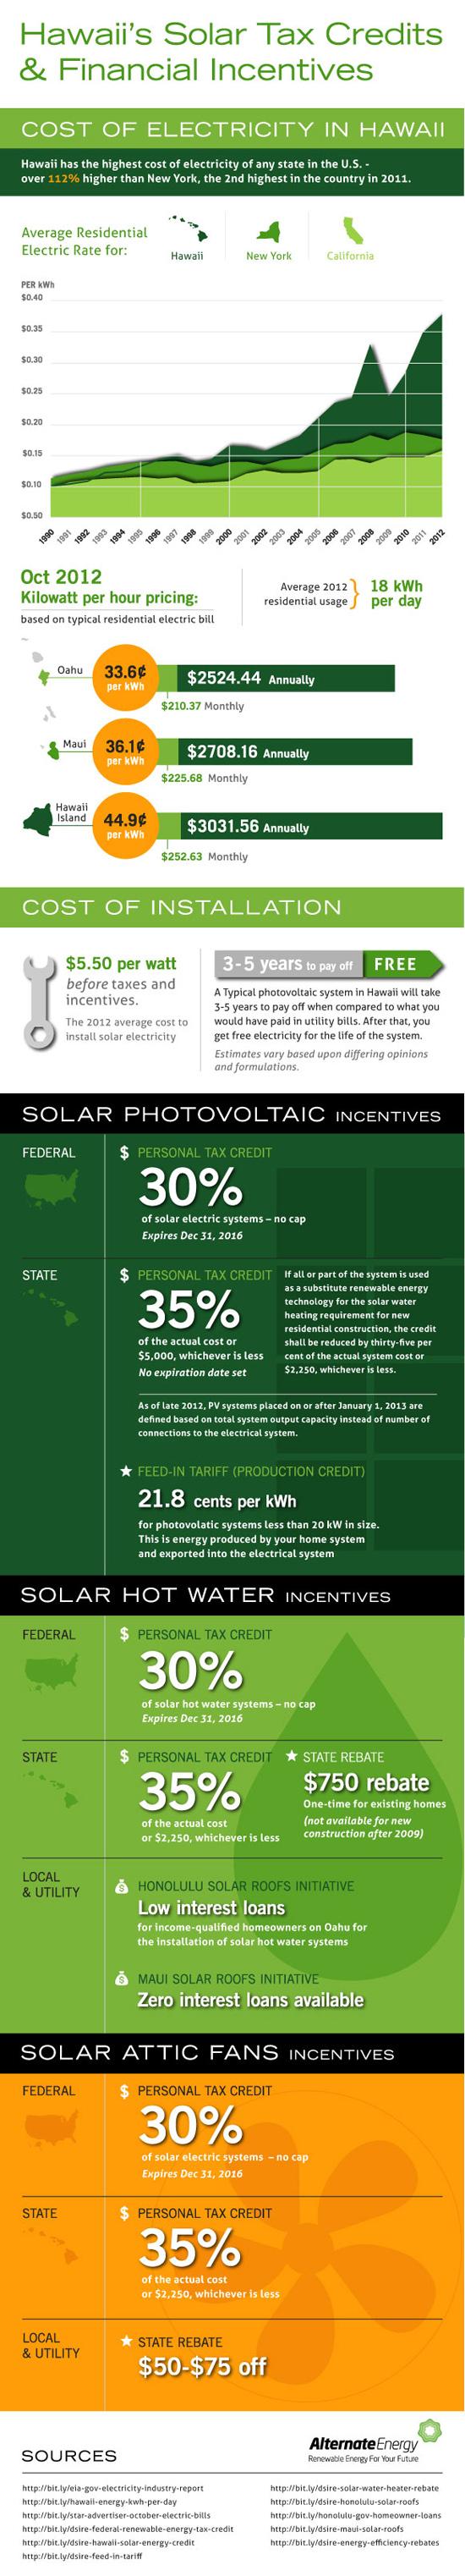 SolarTaxCreditGraphic